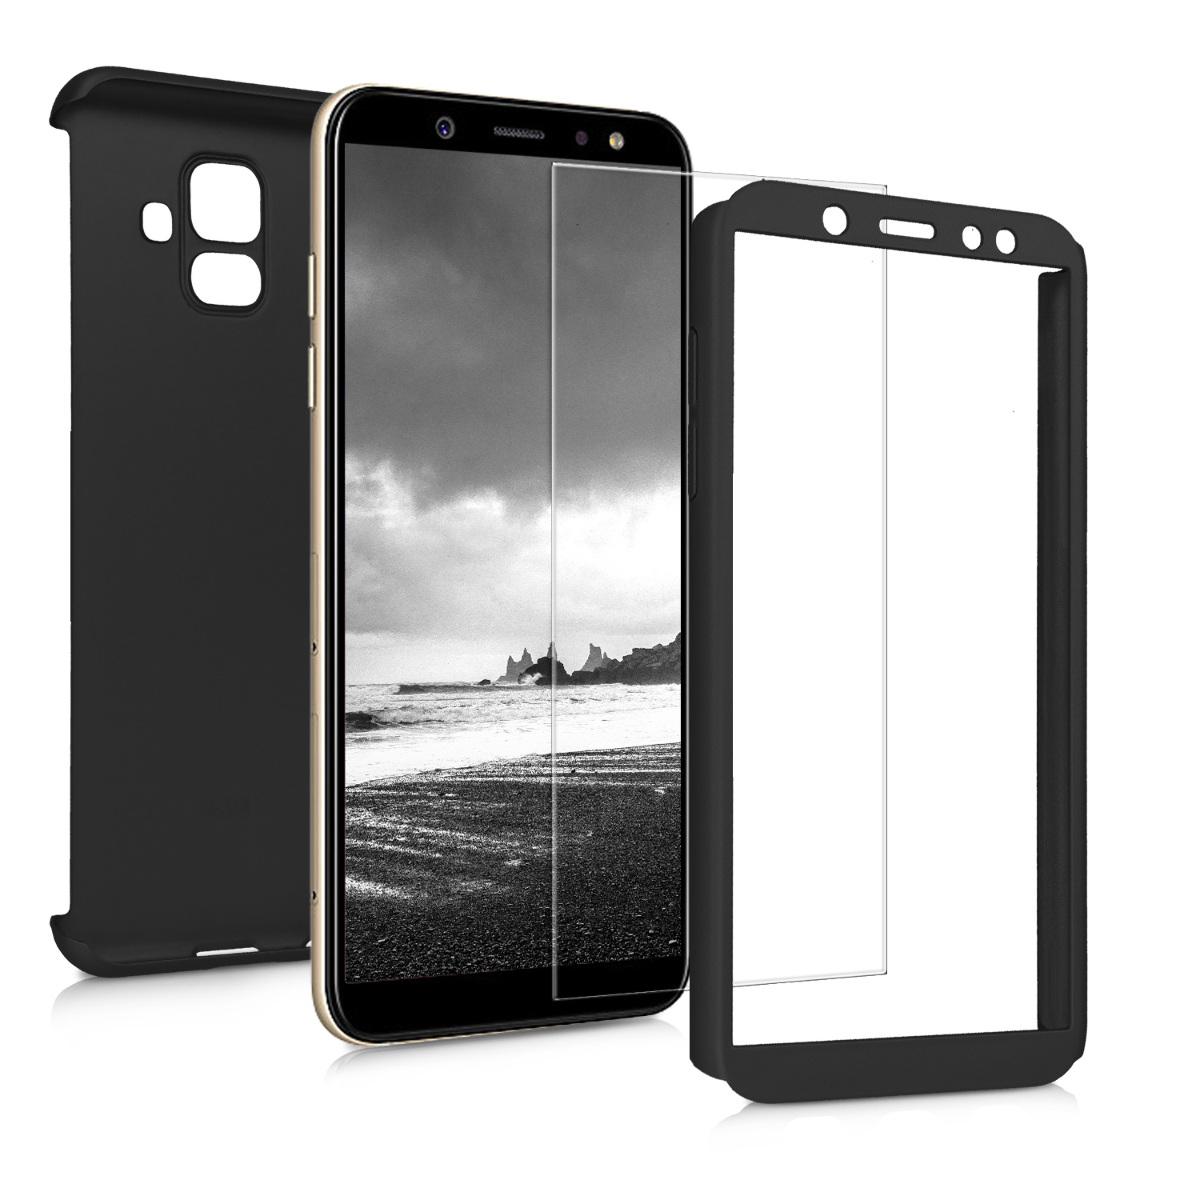 KW Θήκη Full Body with Screen Protector Samsung Galaxy A6 (2018)  - Metallic Black (46337.68)